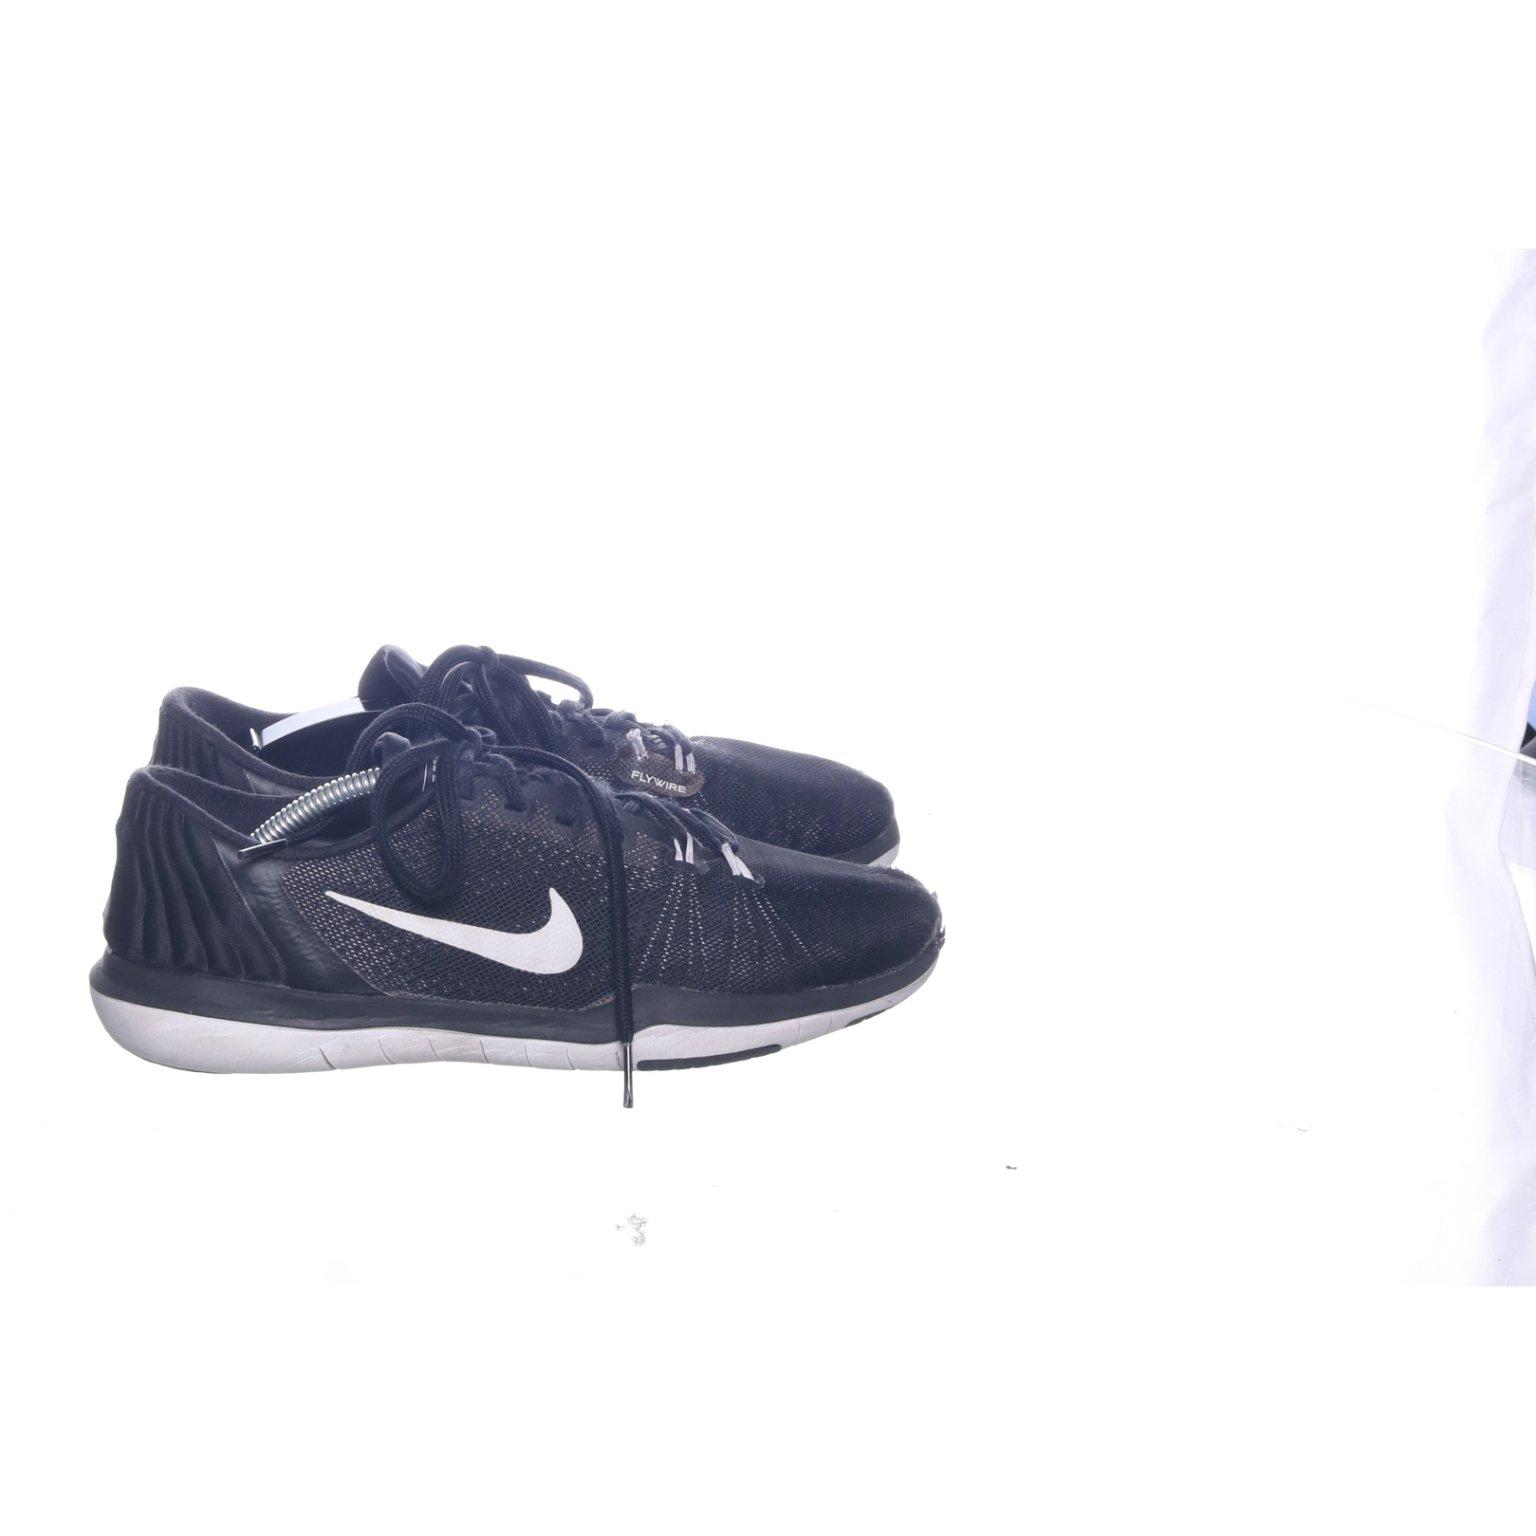 buy online 992fb 5c3ce Nike, Träningsskor, Strl  39, Flywire, Svart Vit